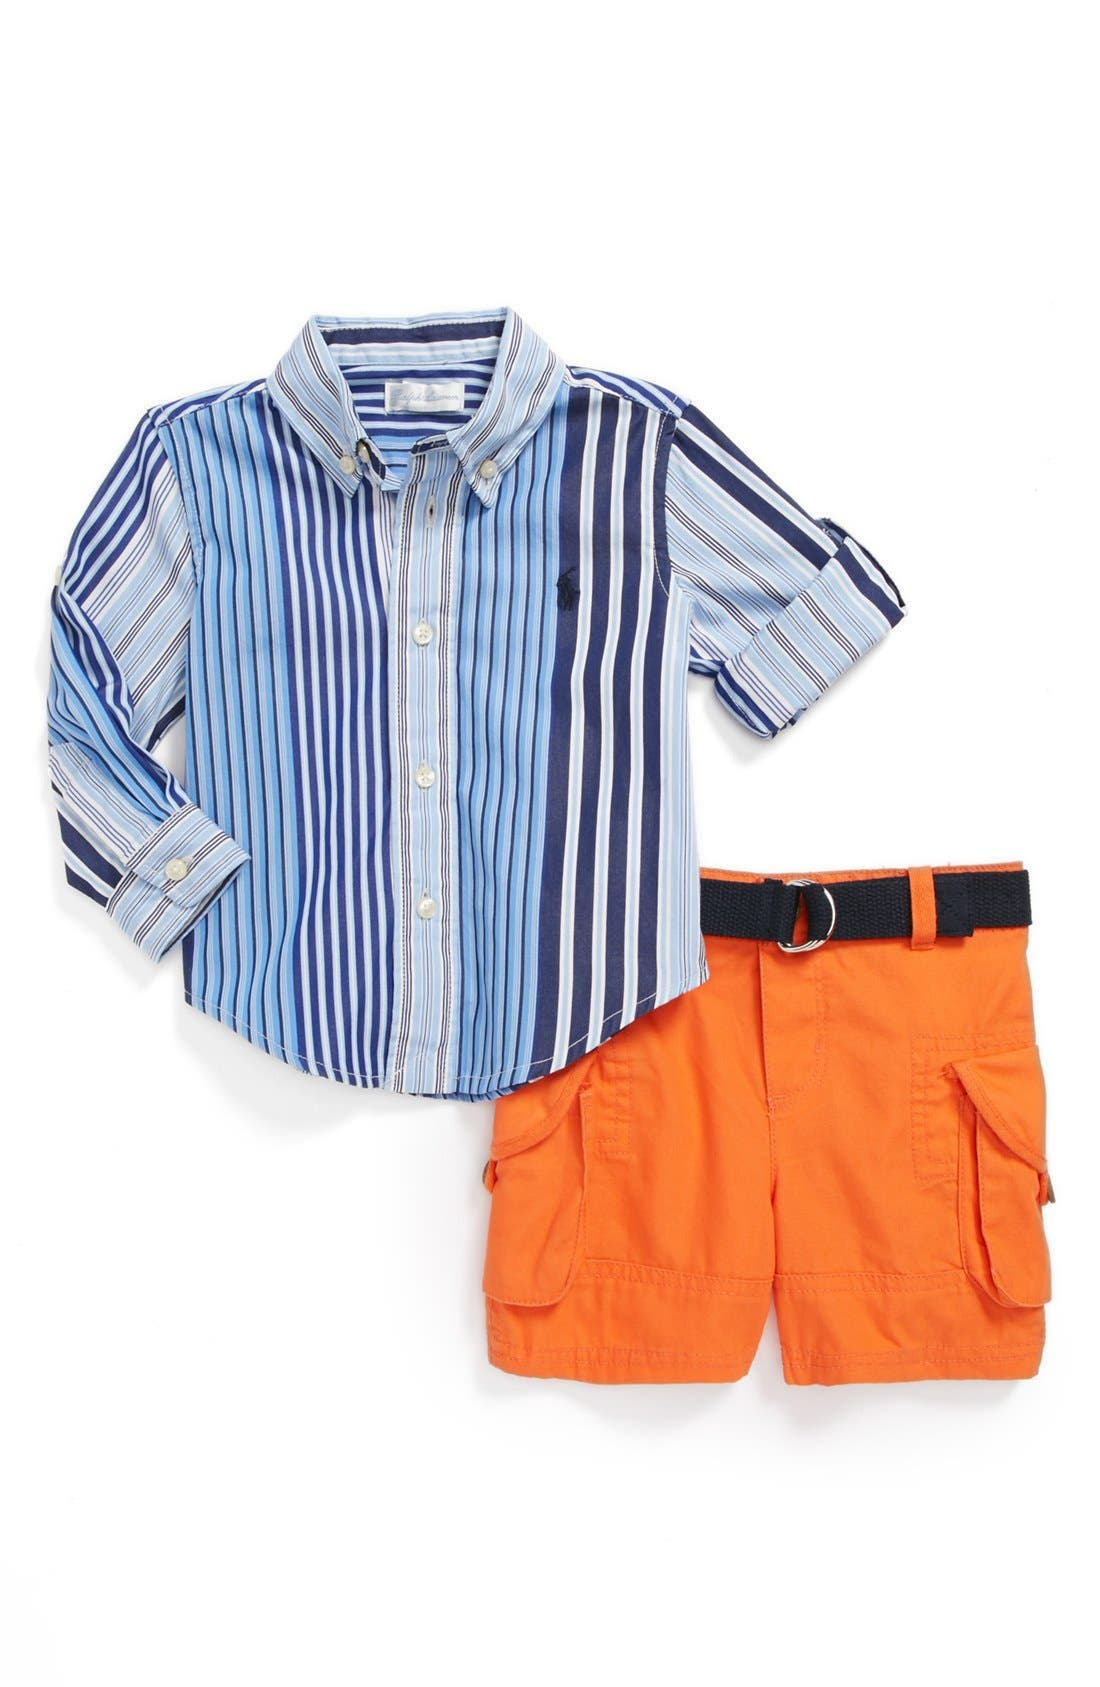 Main Image - Ralph Lauren Stripe Shirt & Cargo Shorts (Baby Boys)